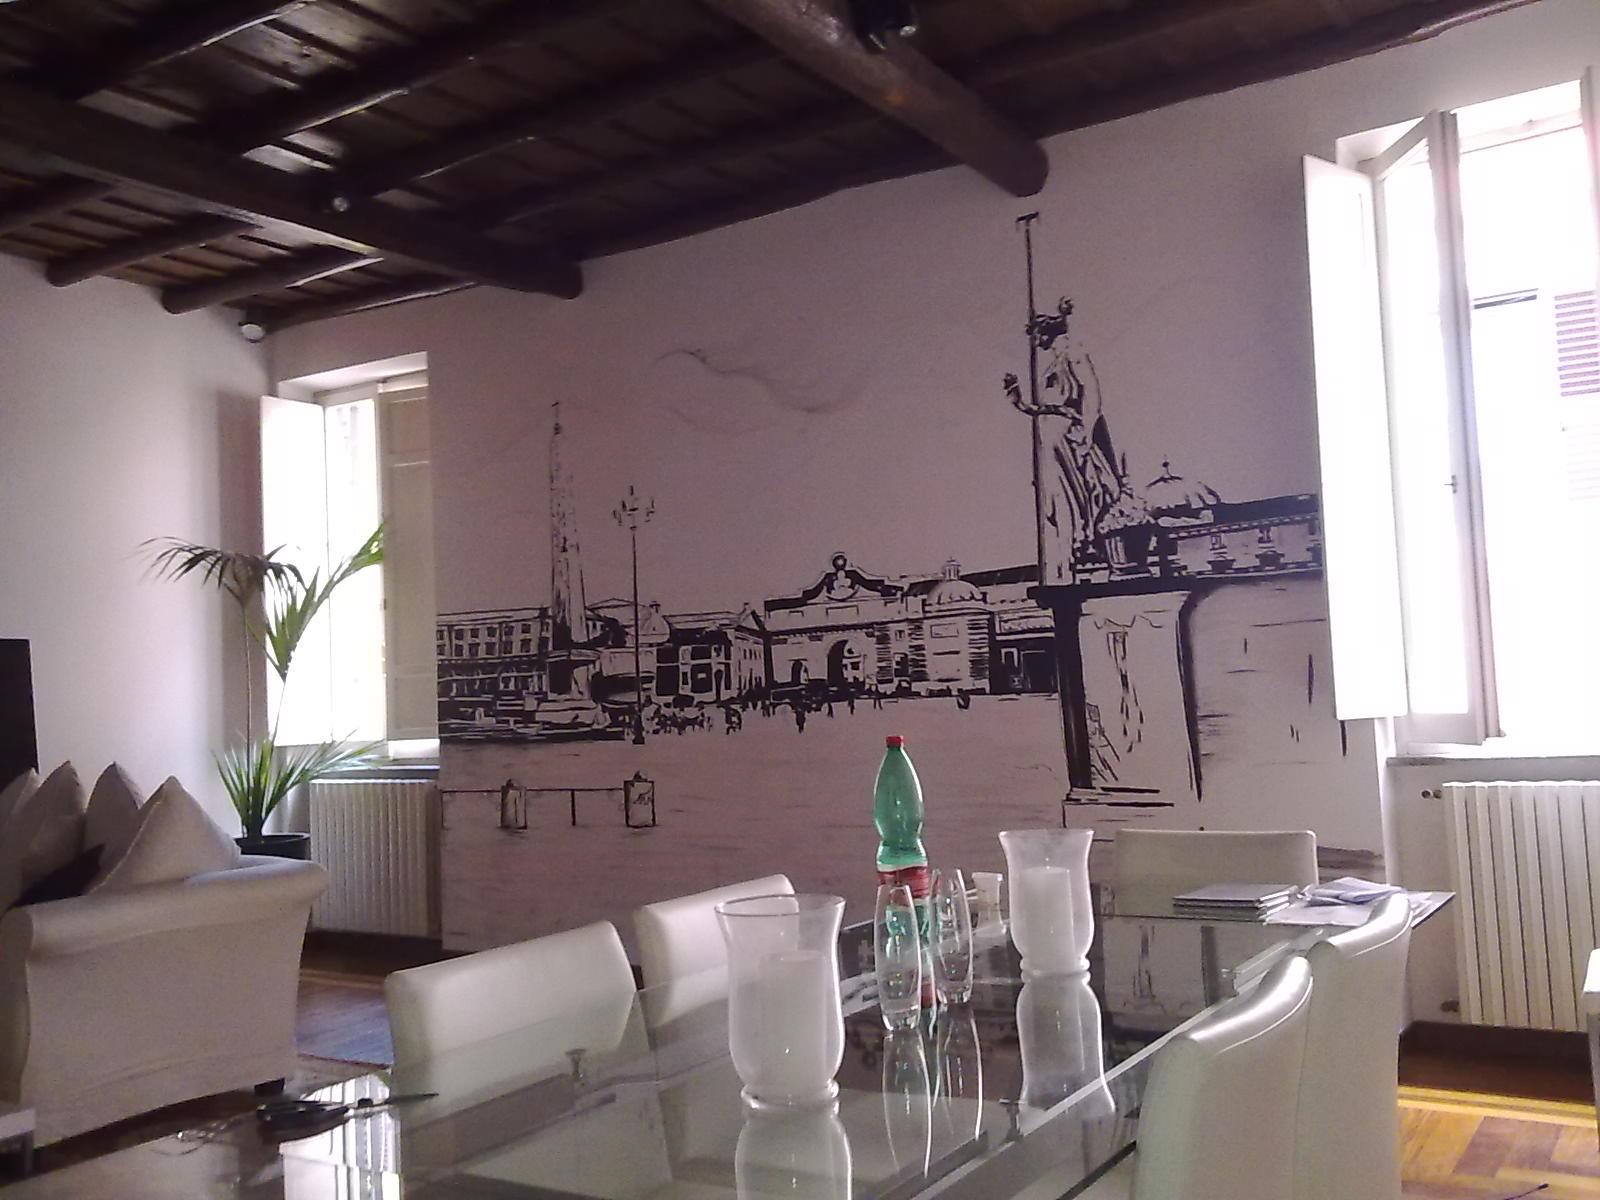 Decorazioni artistiche di francesco ierna decorazioni su pareti e porte a vetro - Decorazioni su pareti ...